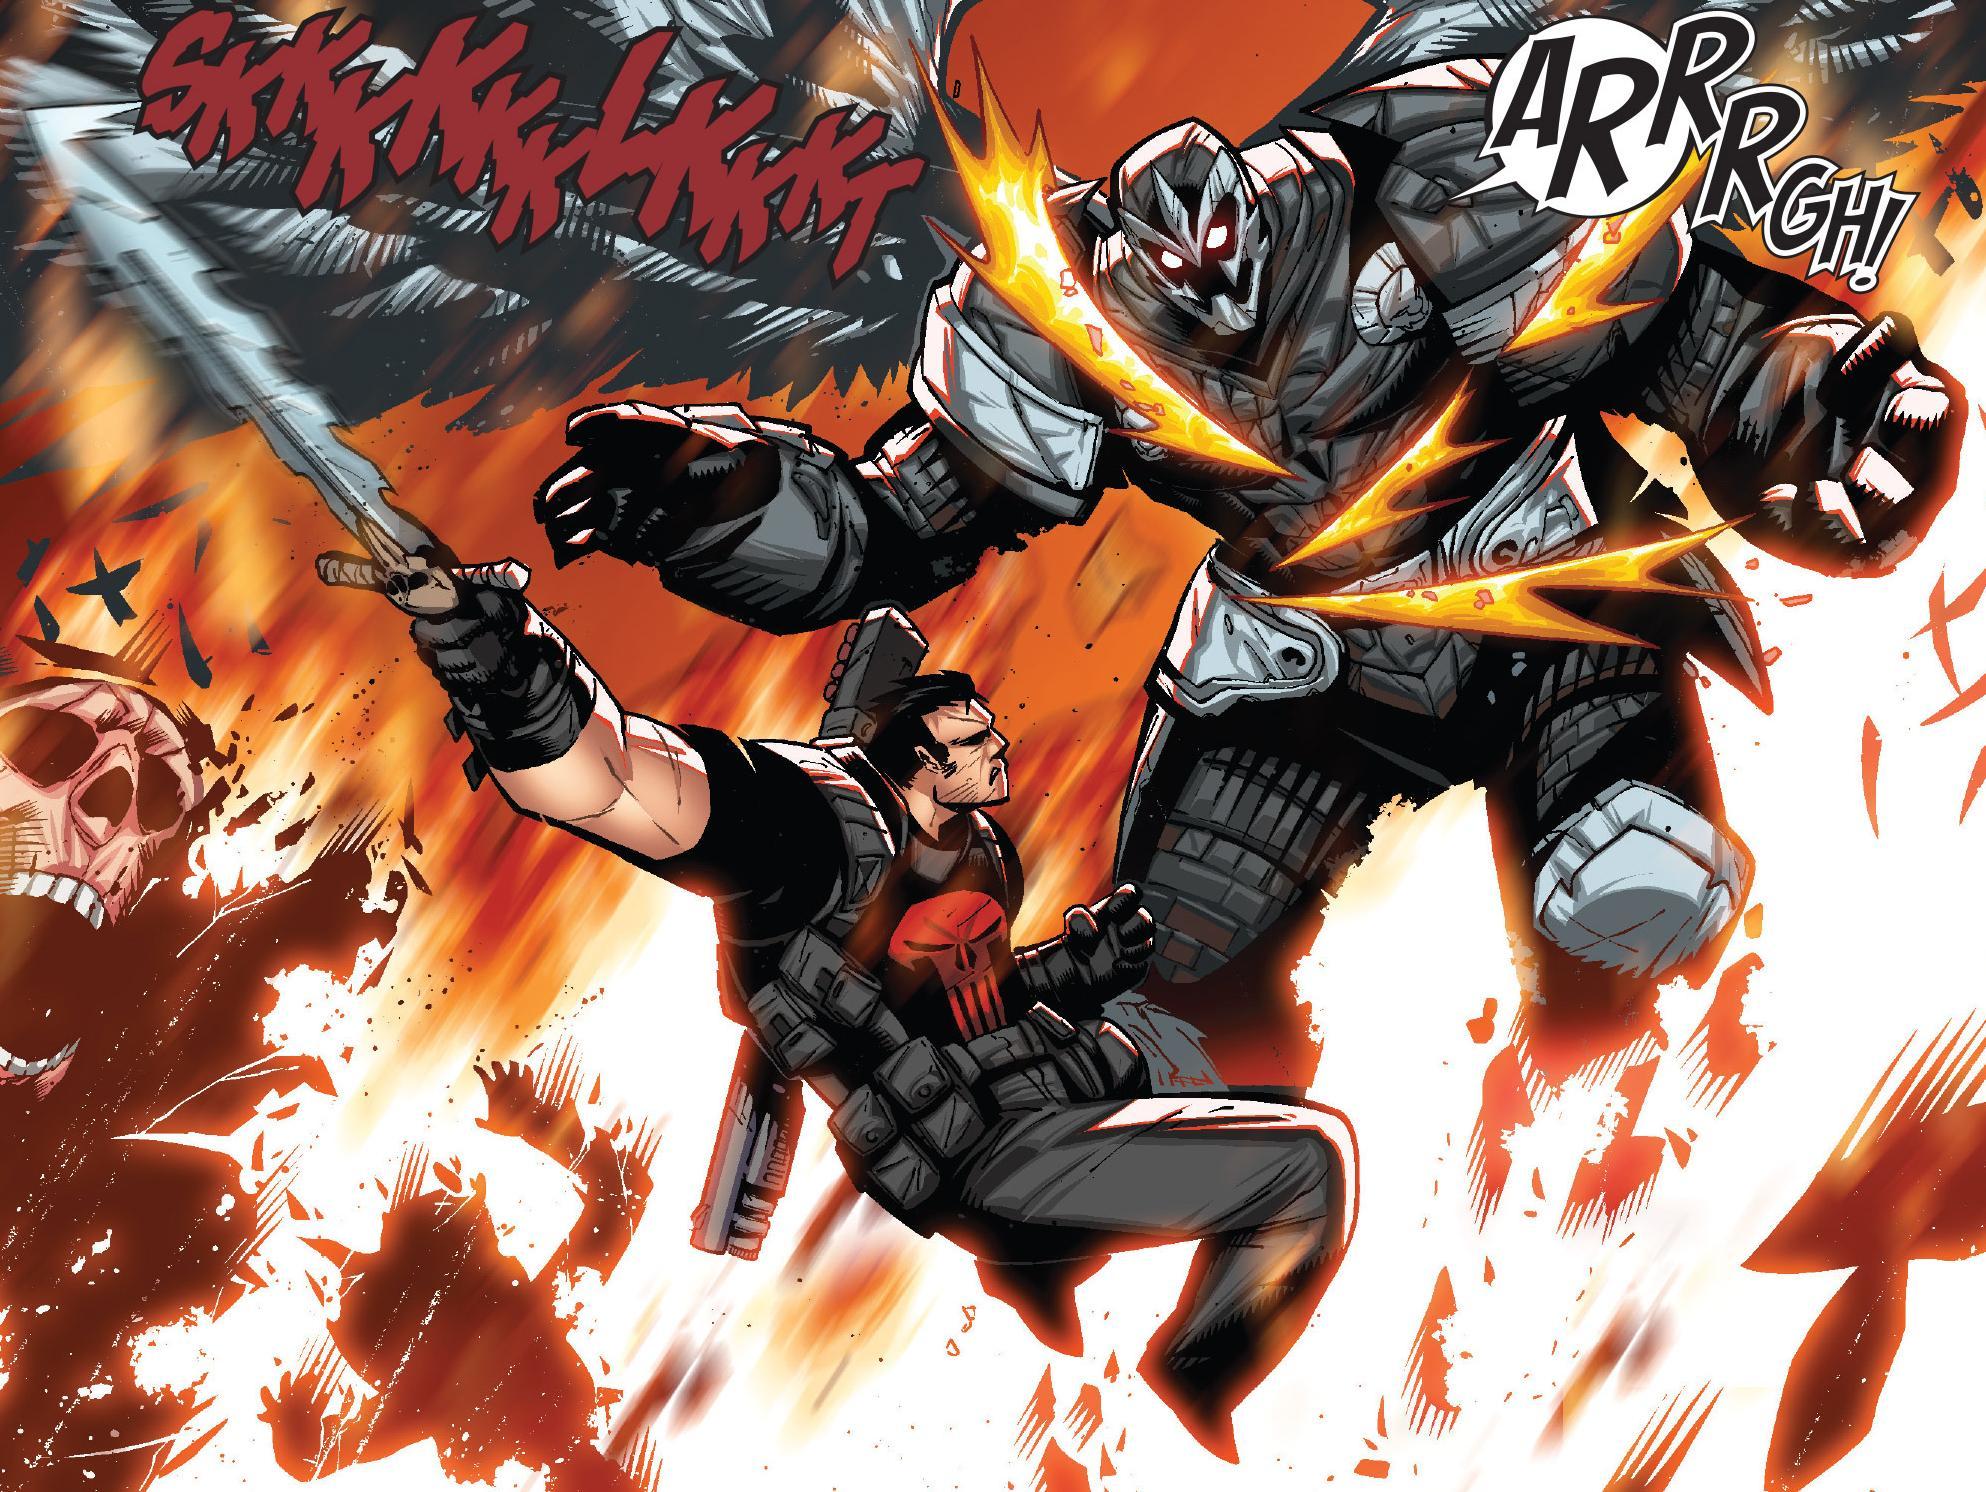 Frank Castle (Earth-616) vs. Zadkiel (Earth-616) from Thunderbolts Vol 2 29 001.jpg